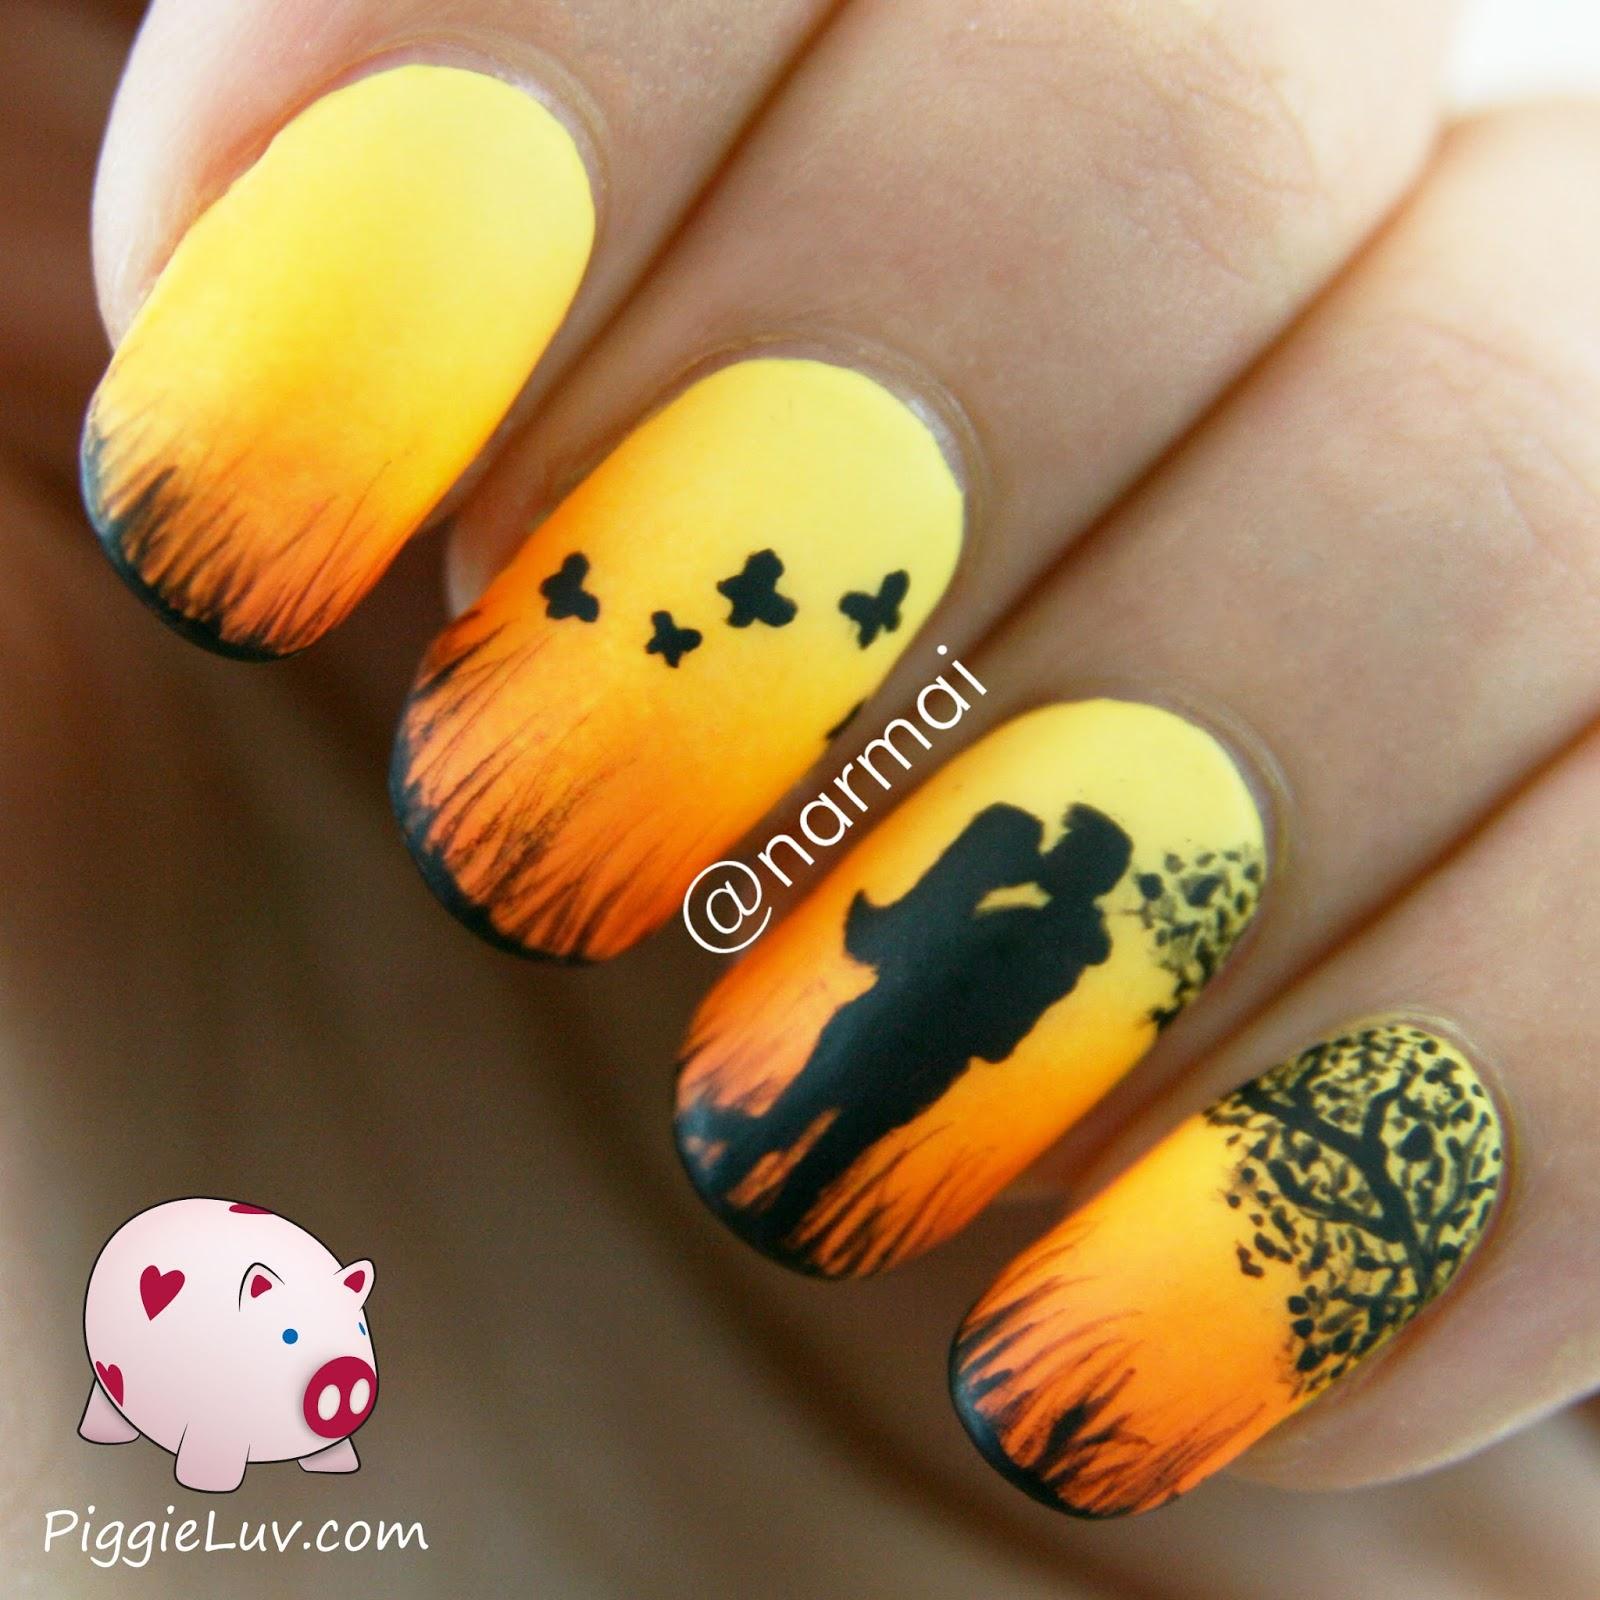 PiggieLuv: Epic love story nails (five manis!)